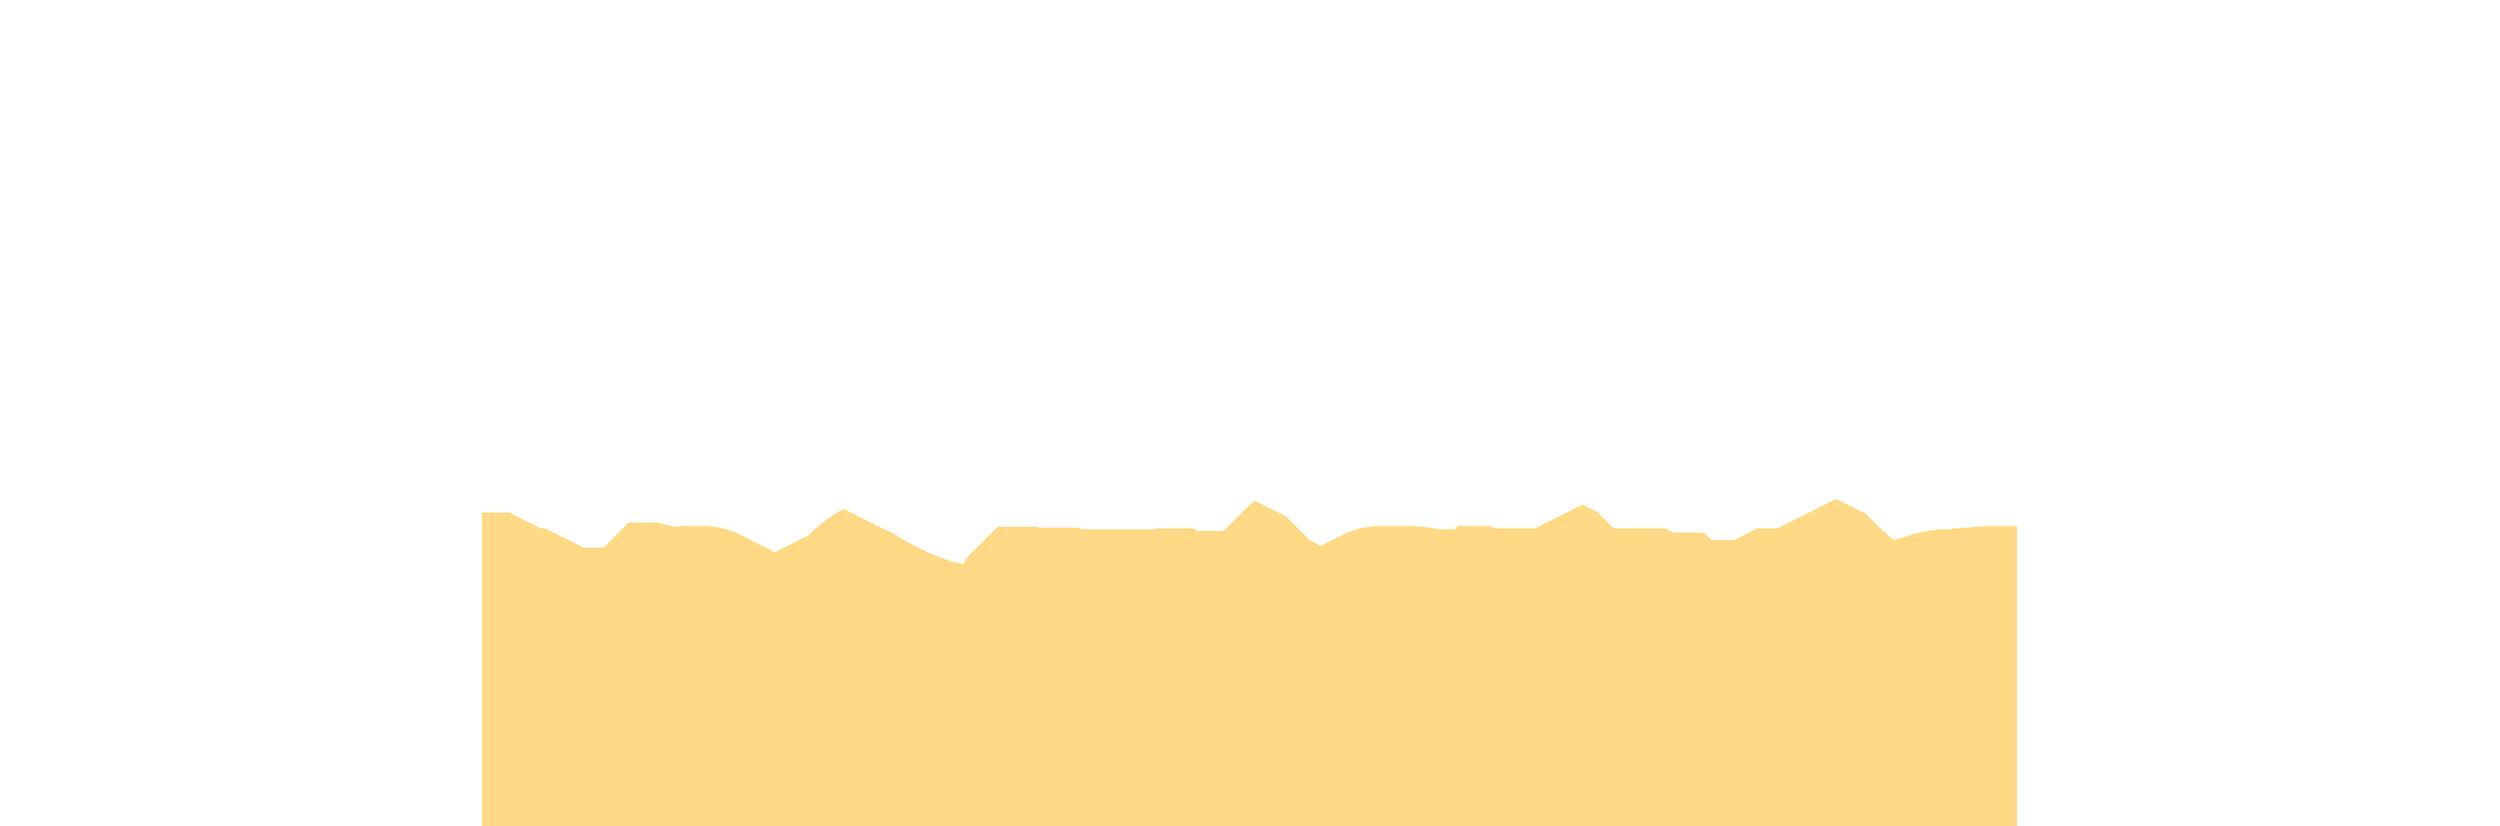 Adacore Techdays La Logo